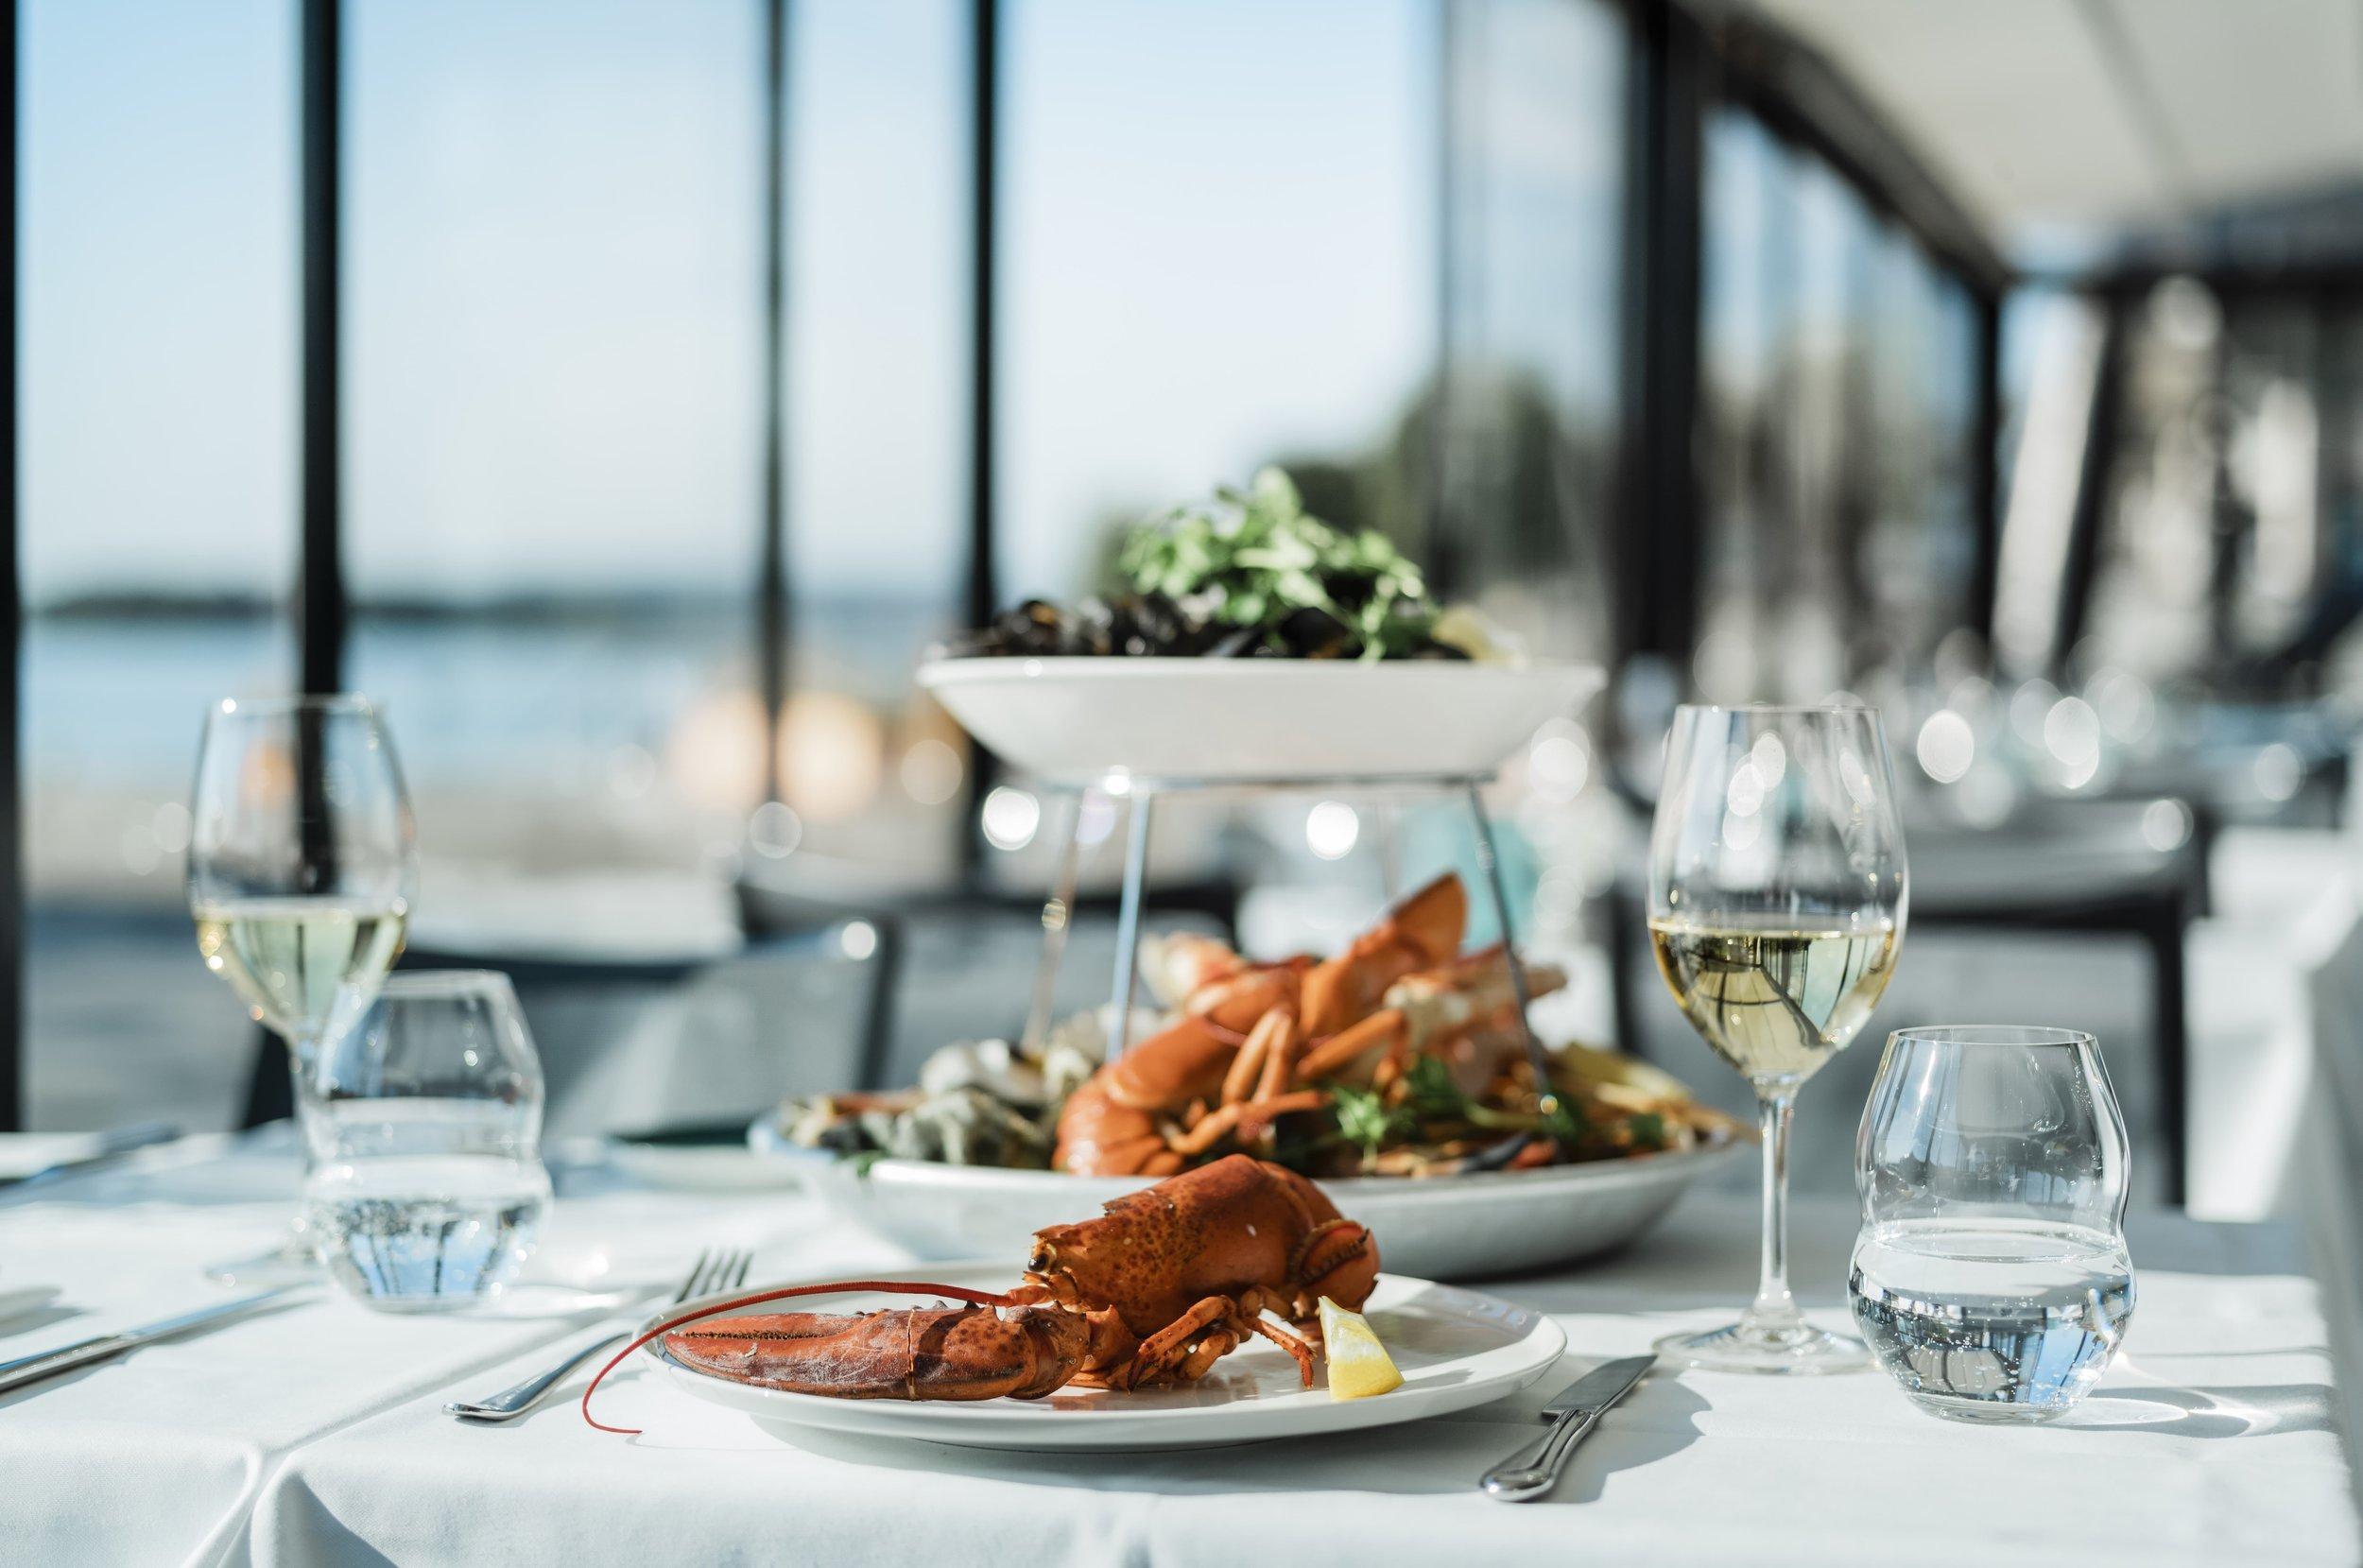 lofoten restaurant oslo